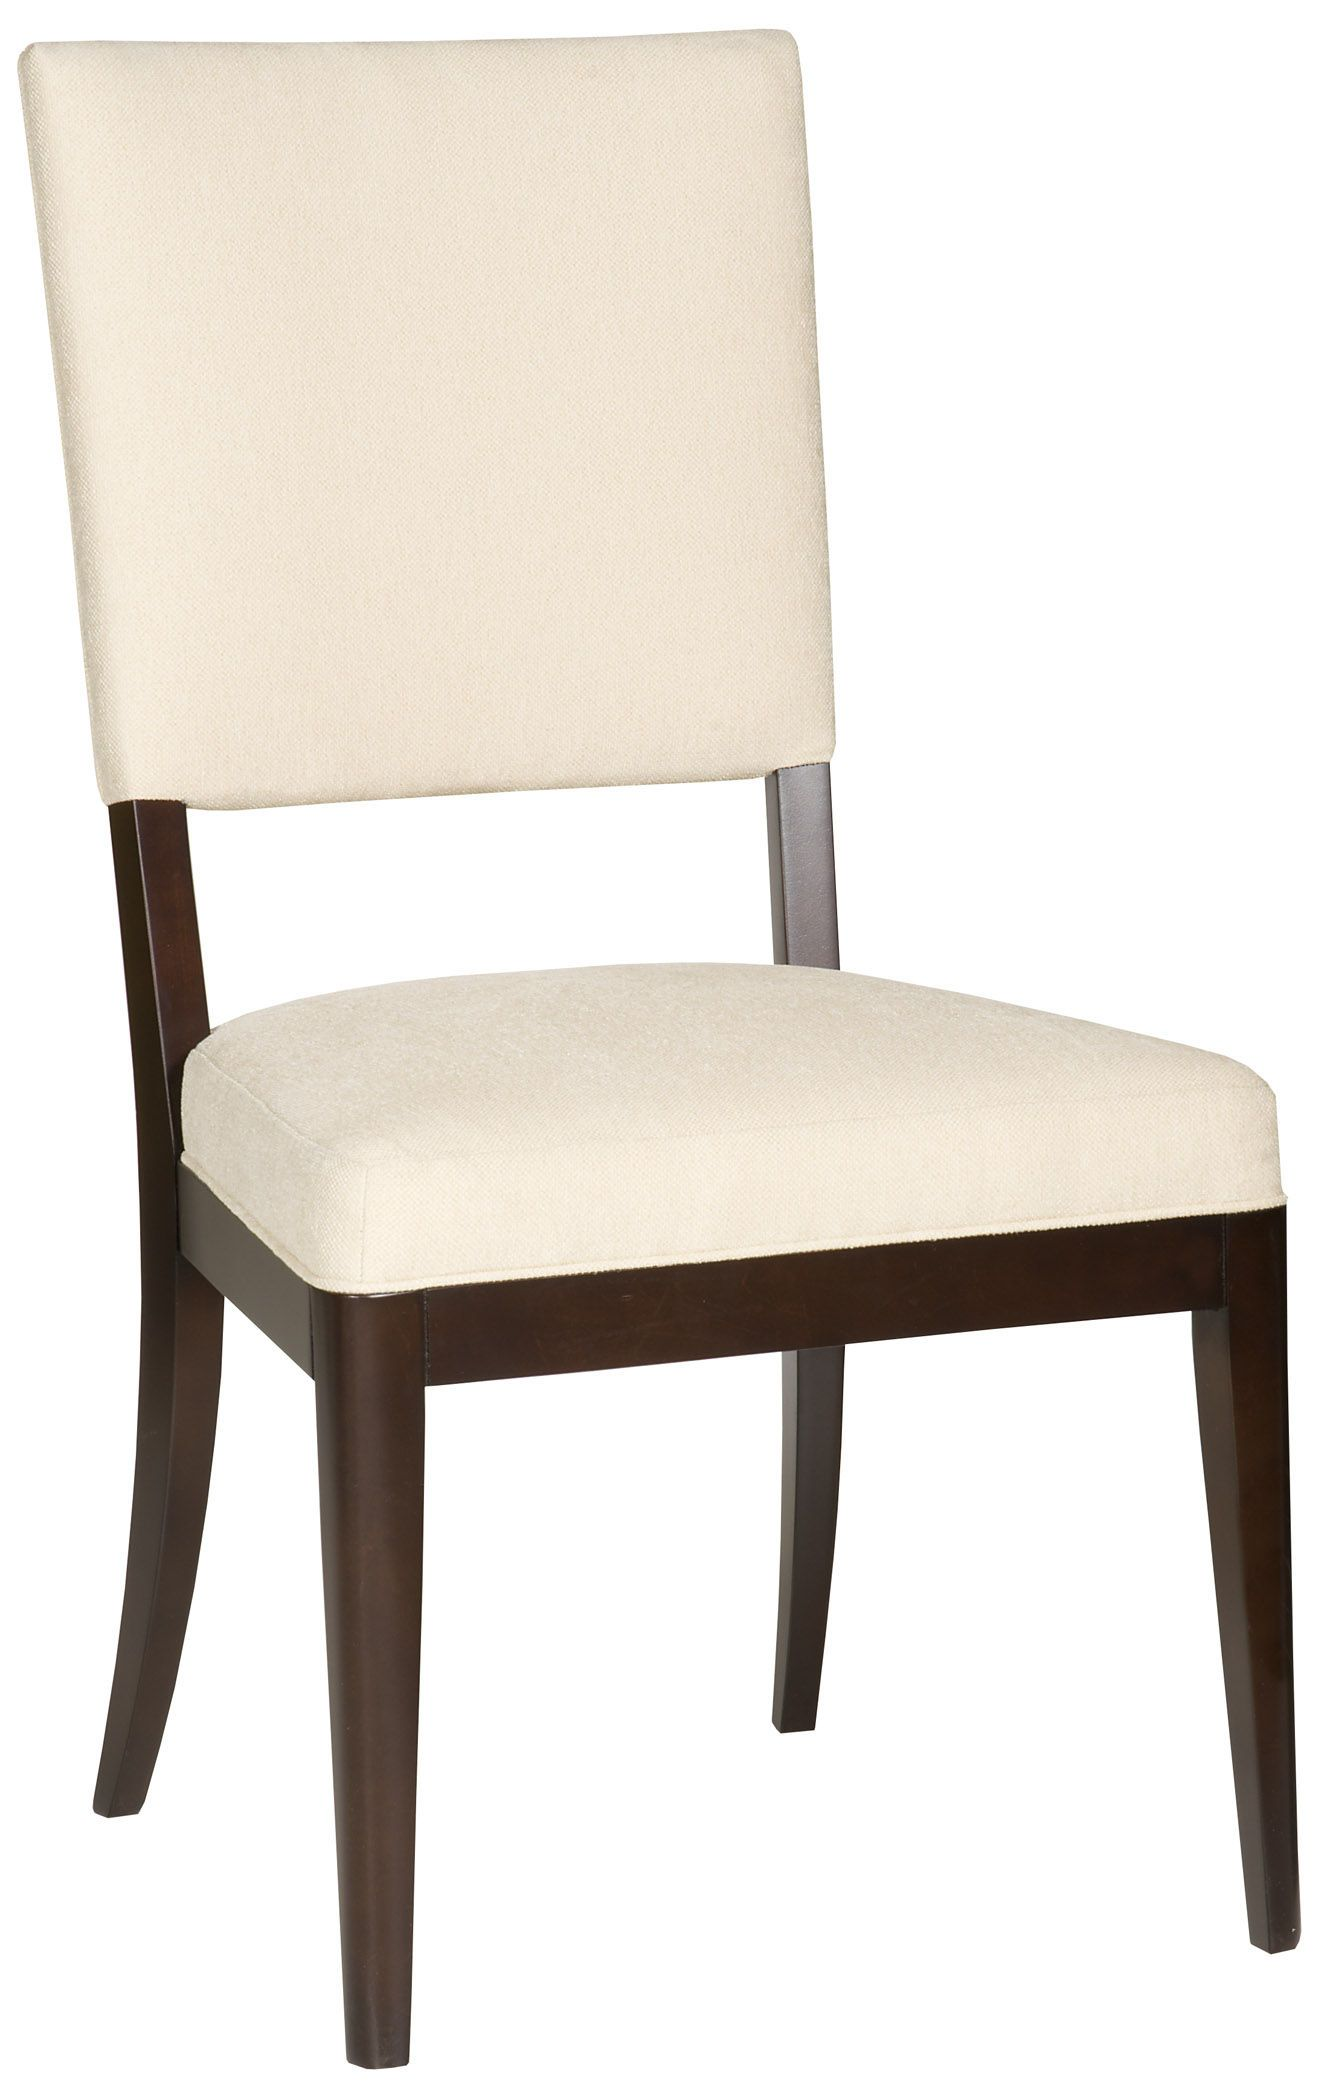 Superieur Vanguard Dining Room Juliet Side Chair V12 CH   Vanguard Furniture   Conover,  NC